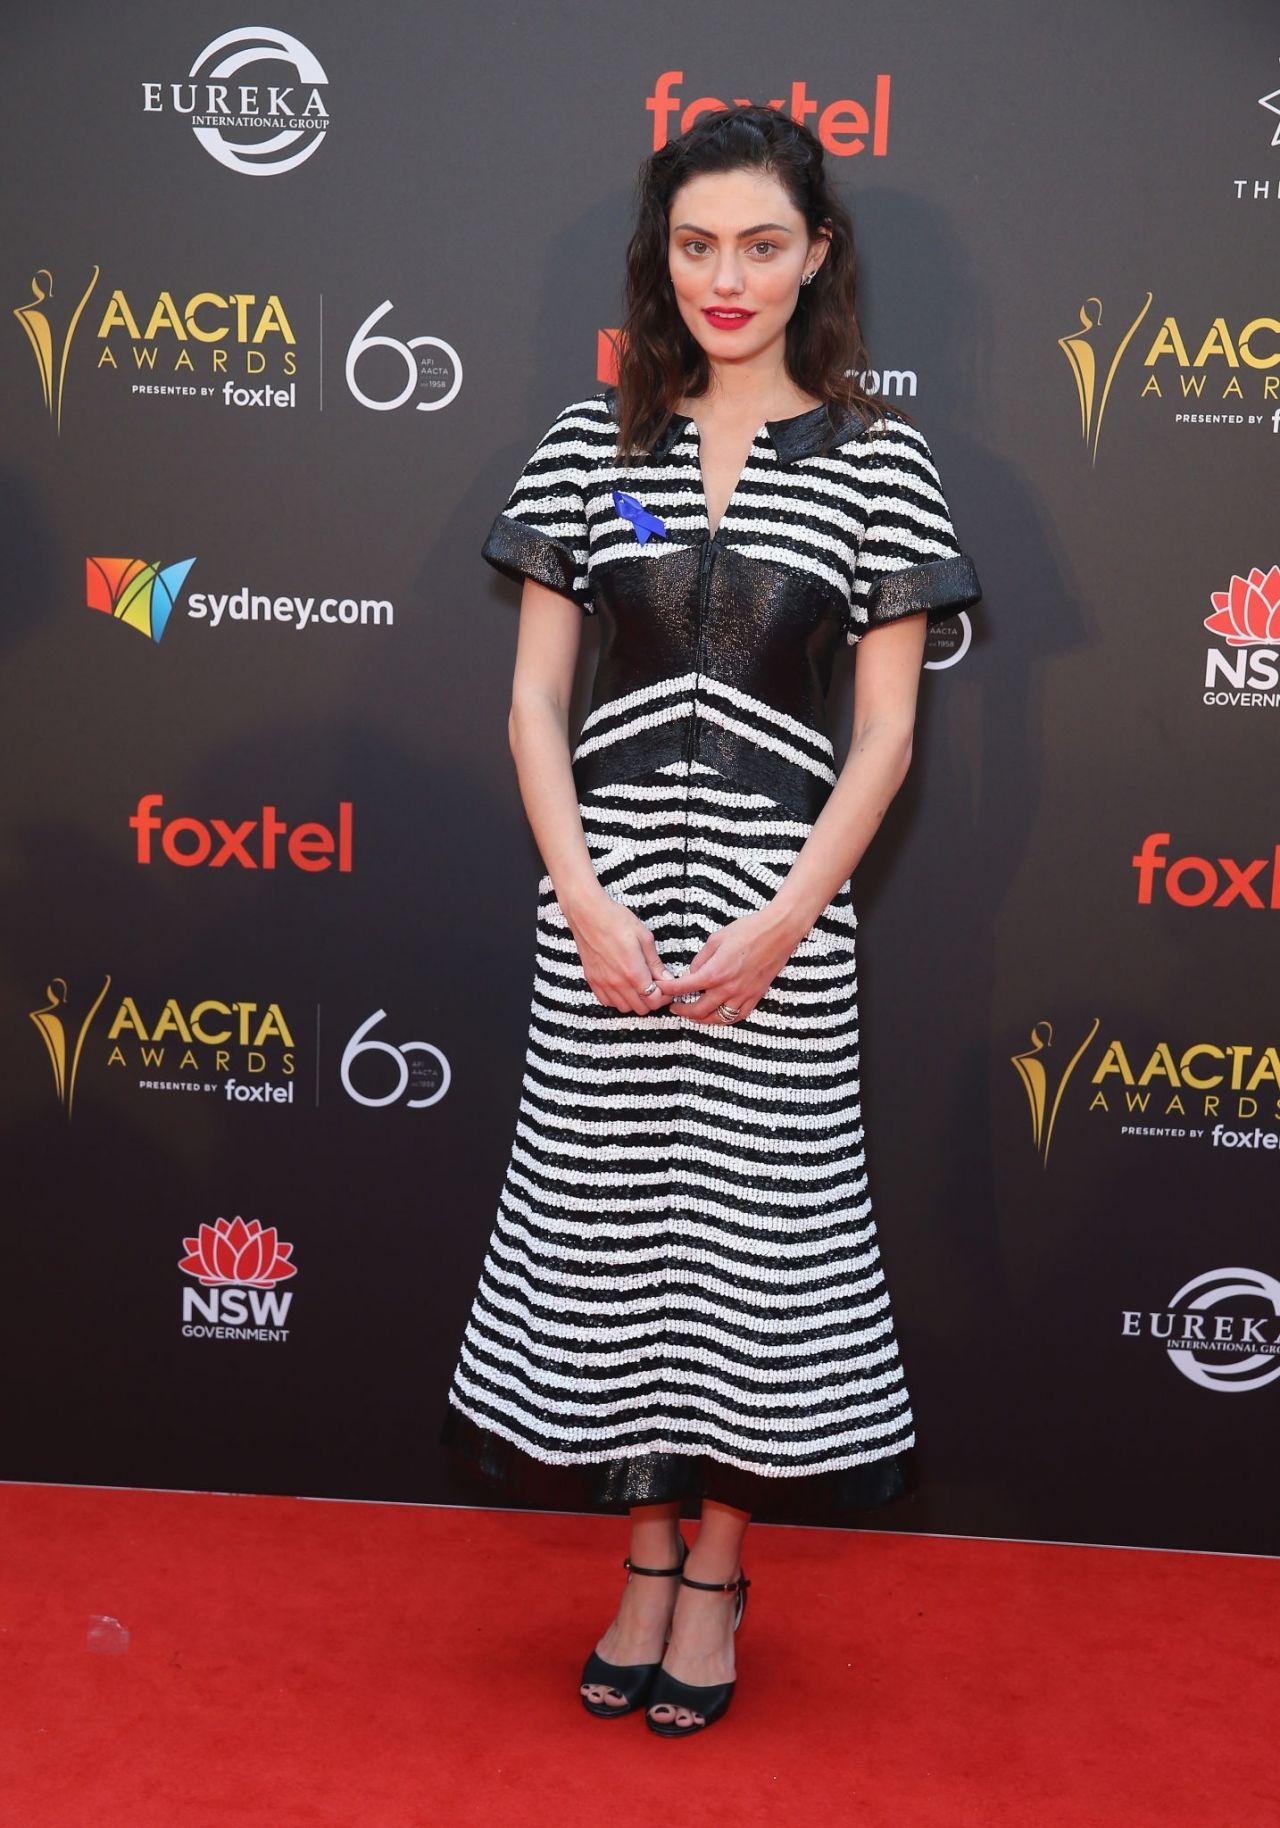 aacta awards - photo #3